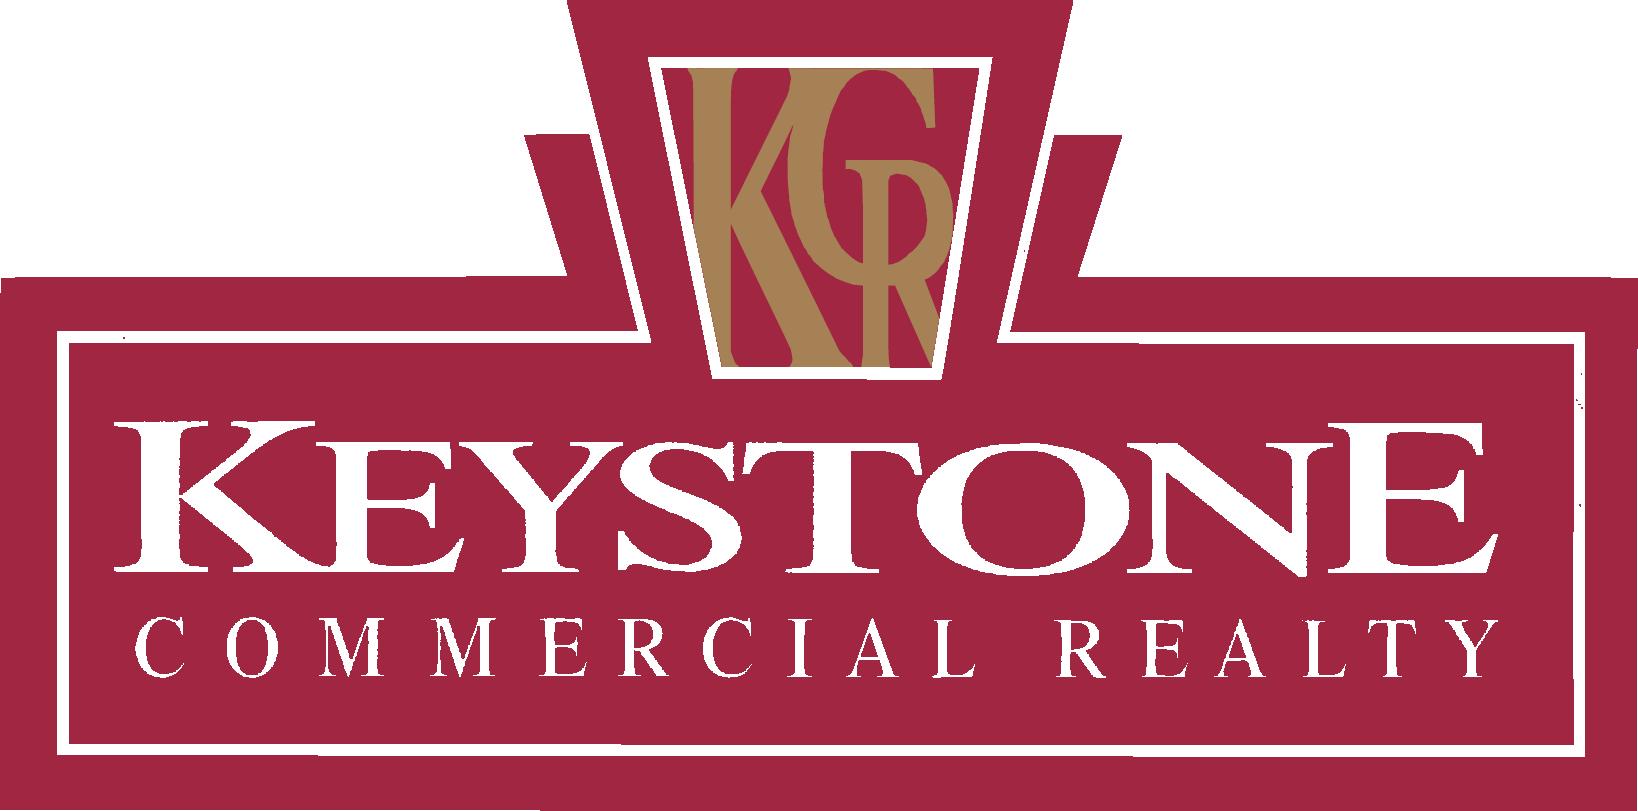 Keystone Commercial Realty